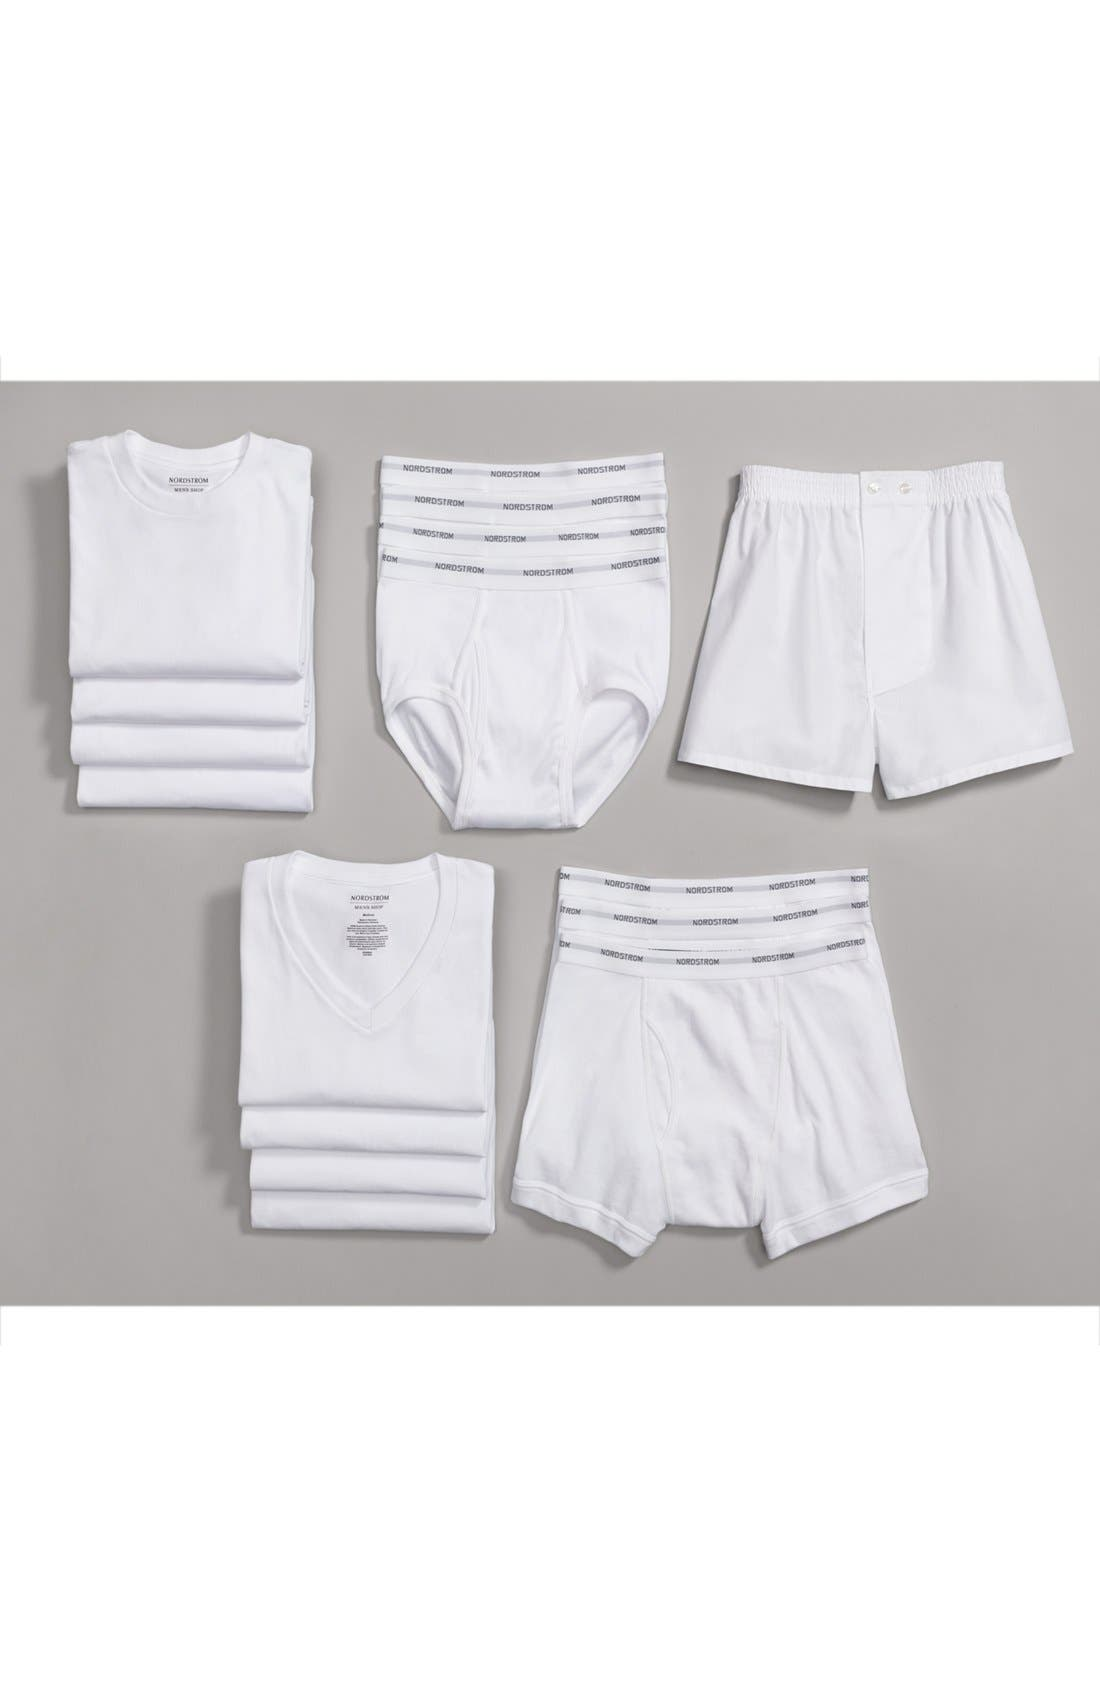 NORDSTROM MEN'S SHOP, 4-Pack Regular Fit Supima<sup>®</sup> Cotton V-Neck T-Shirts, Alternate thumbnail 9, color, WHITE